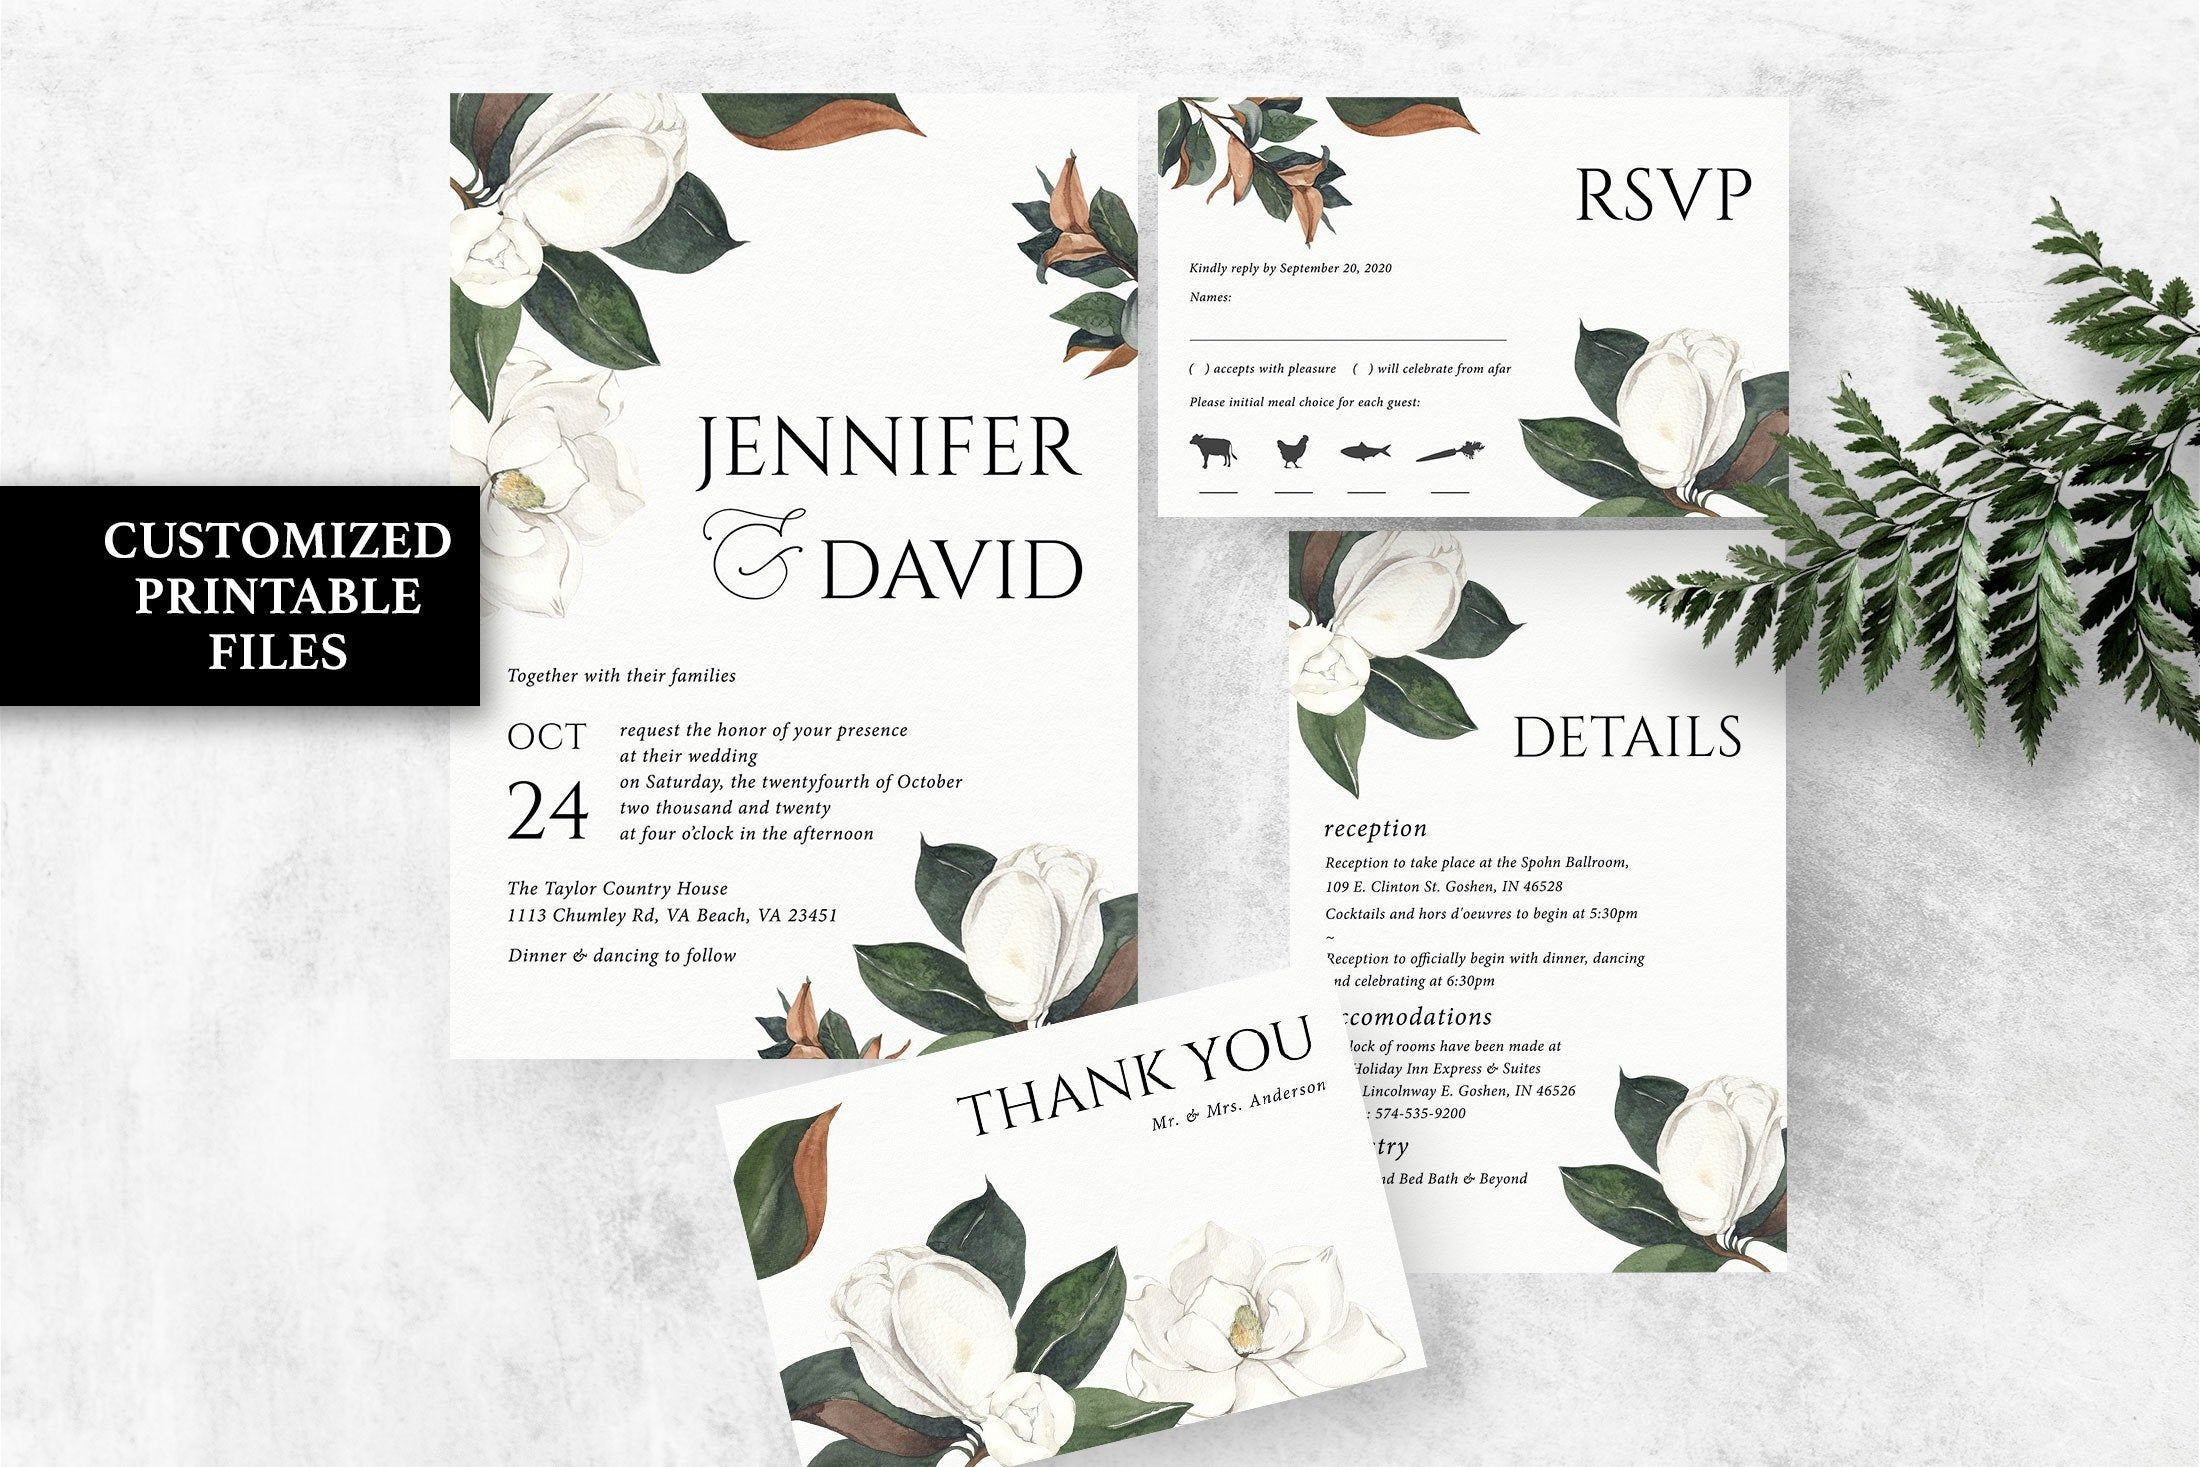 Floral Wedding Invitation Printable Magnolia Invitation Suite White Flowers Wedding Invites Spring Summer Greenery Wedding Invitation Set In 2020 Floral Wedding Invitations Printable Floral Wedding Invitations Popular Wedding Invitations